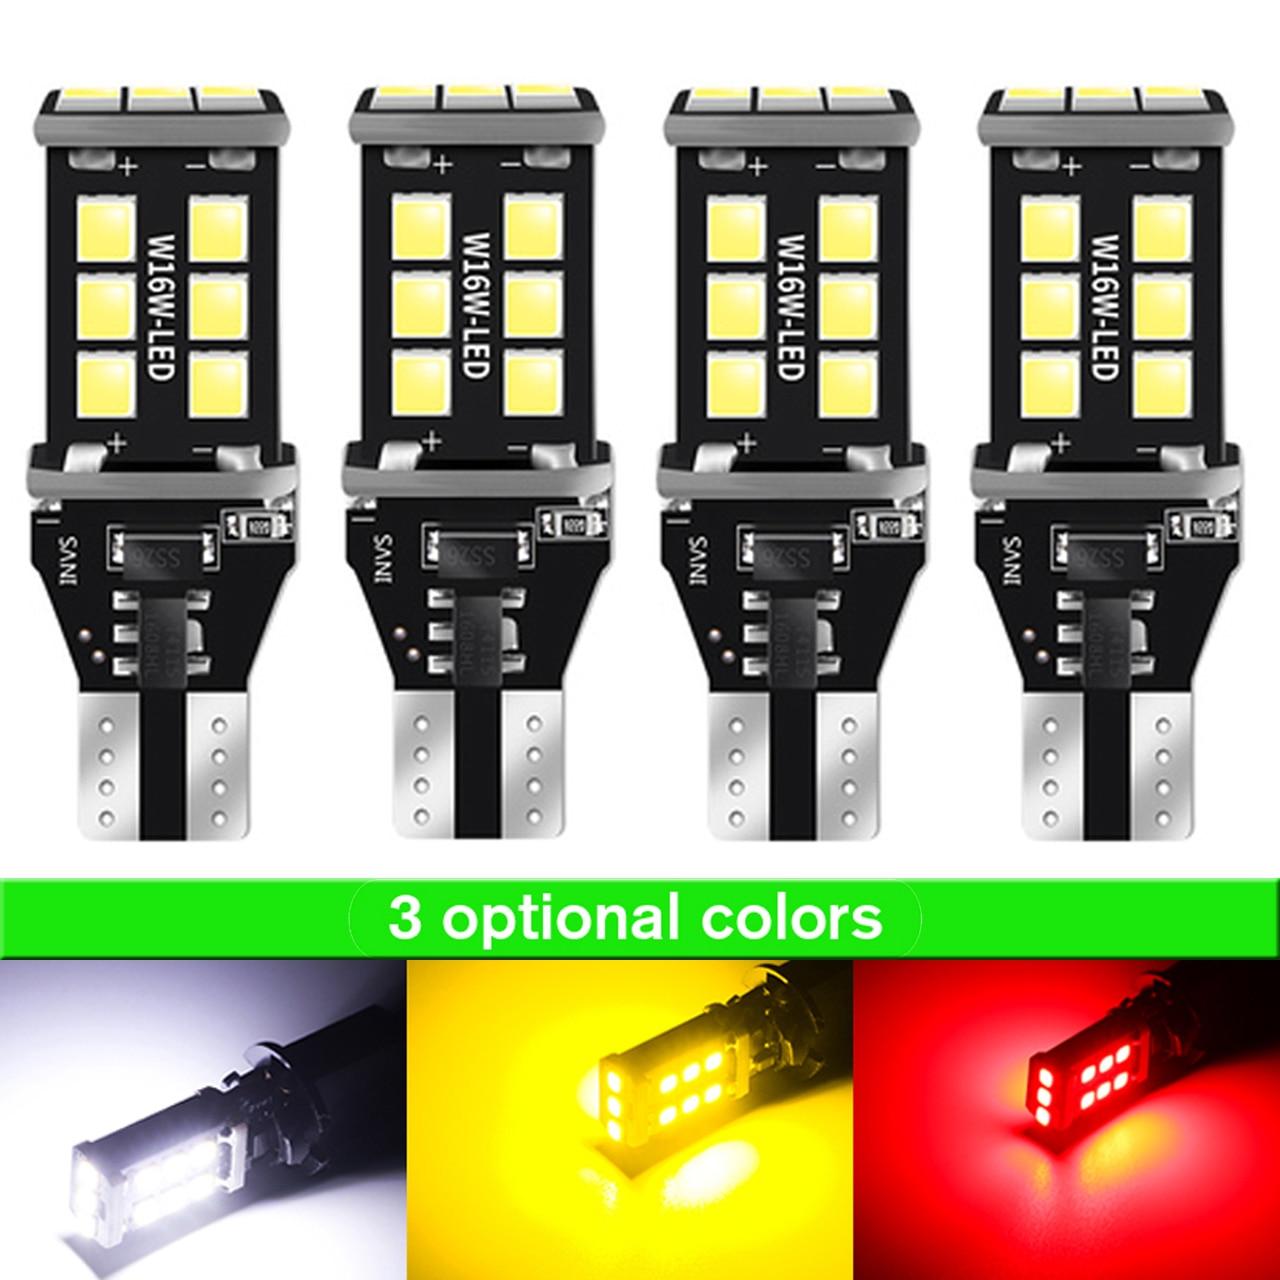 4pcs  T15 W16W LED 15SMD 2835  Filament Light Bulbs 5W Turn Signal Tail Parking Reverse Lamp Indicator Lamp Red White Yellow